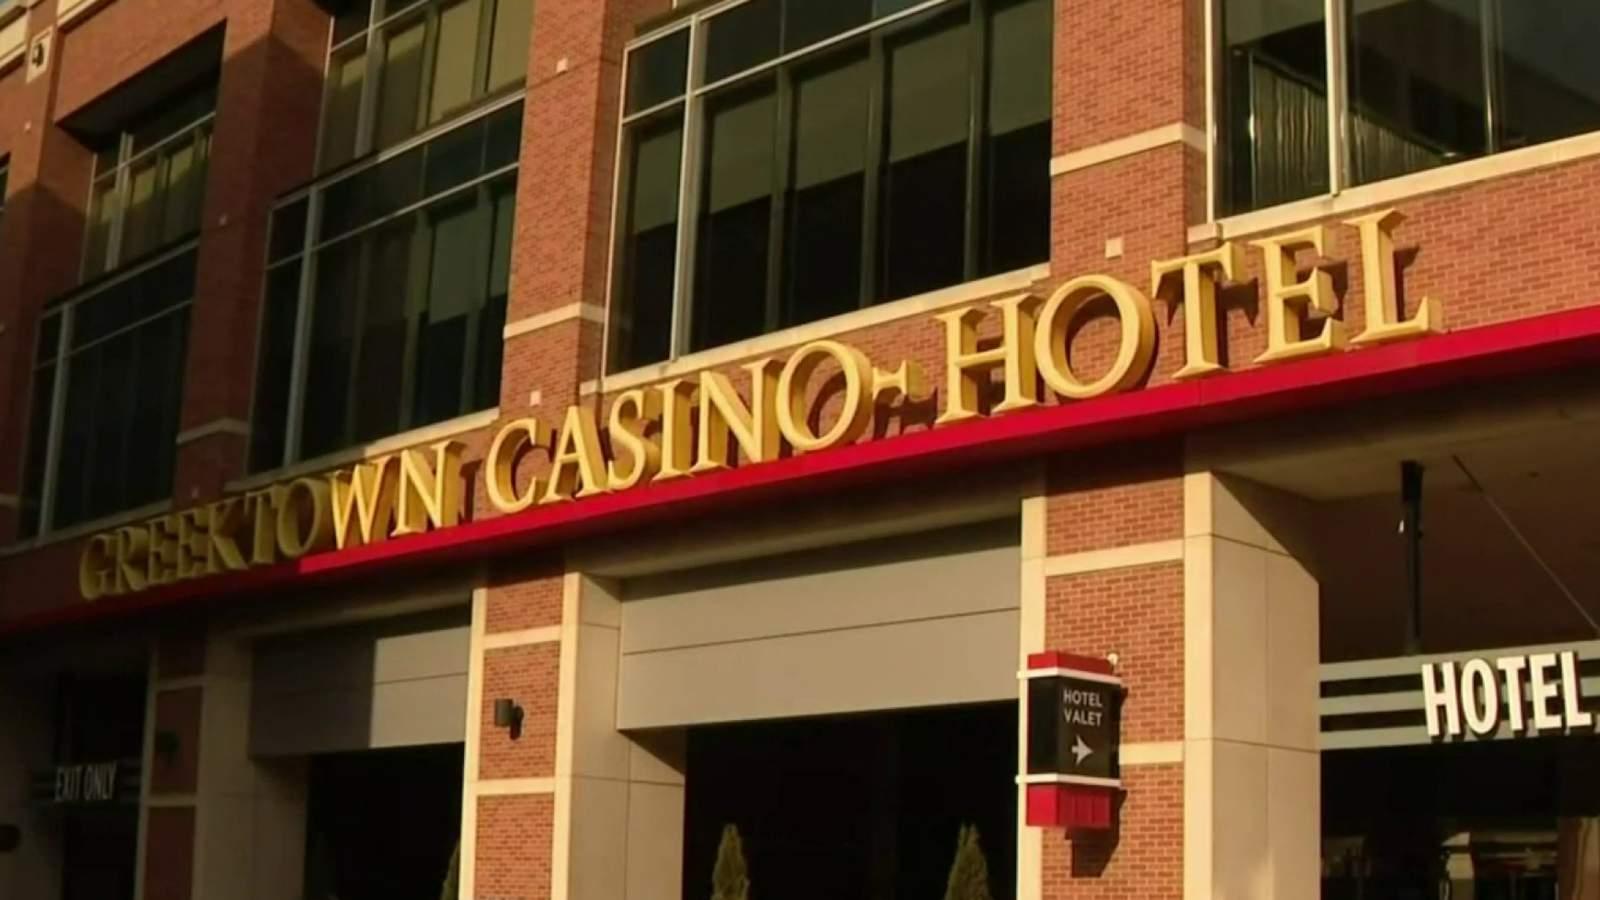 Casino suicide detroit casino payout odds